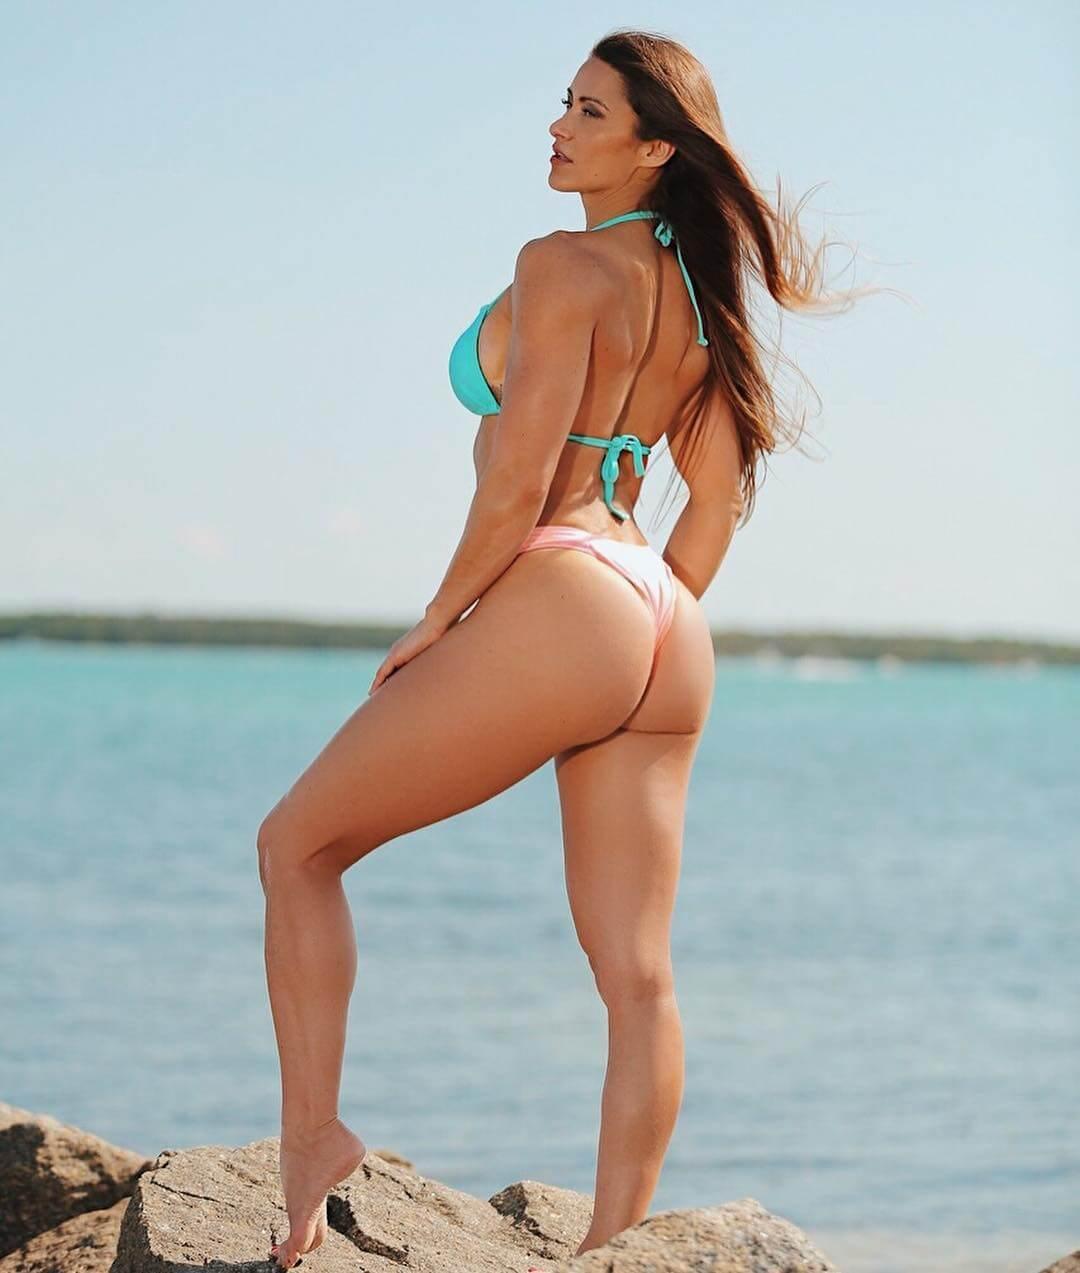 Anais Zanotti Porn Star 50 hot and sexy anais zanotti photos - 12thblog